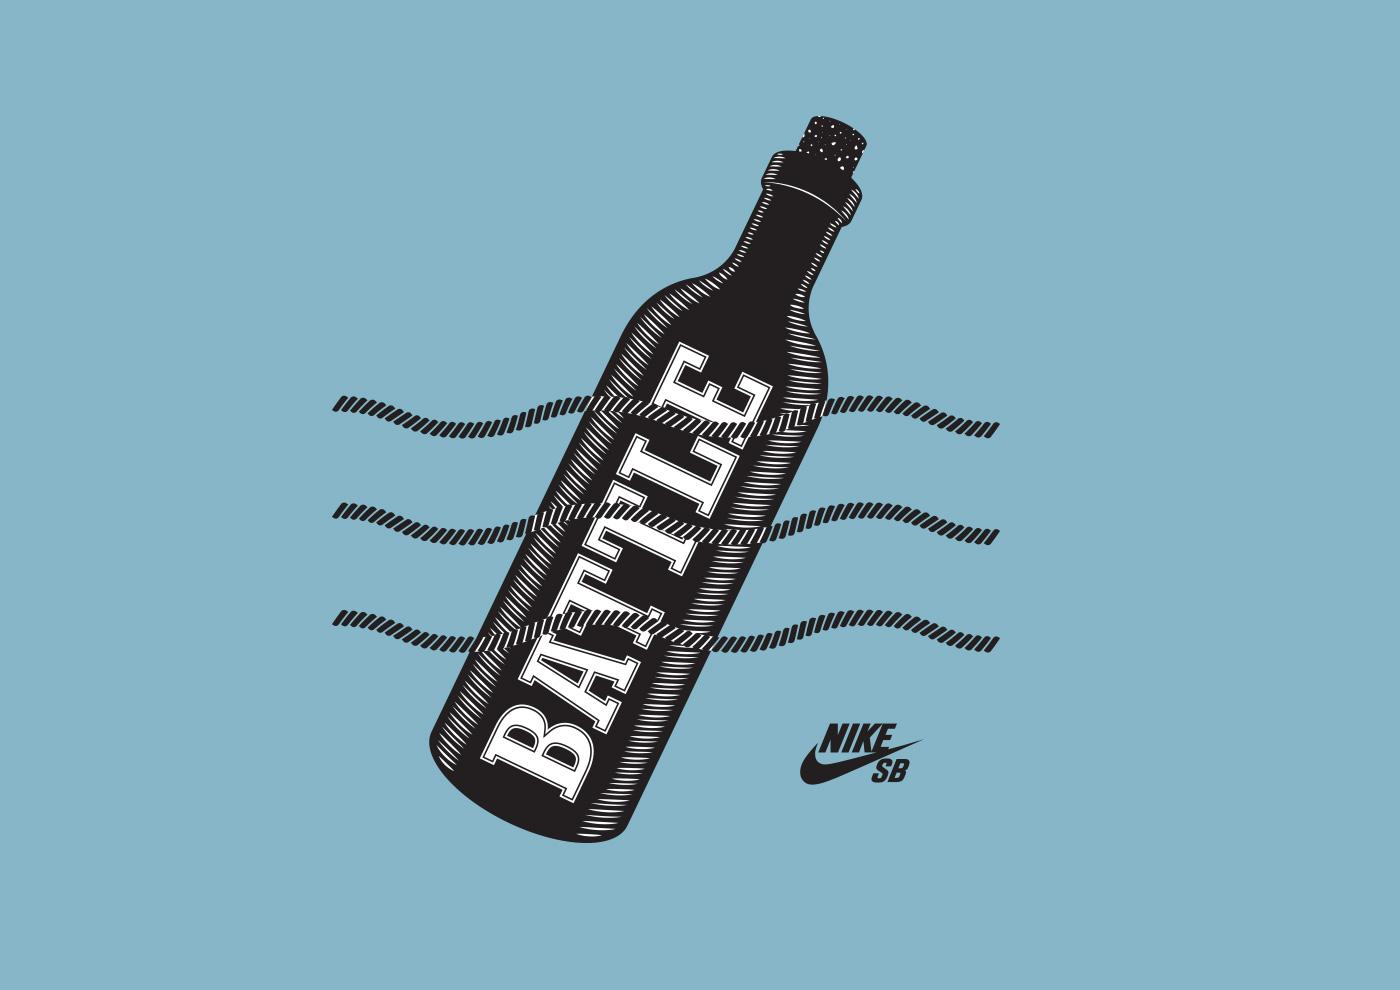 NikeSBbattle_portfolio_1400x790_11.jpg